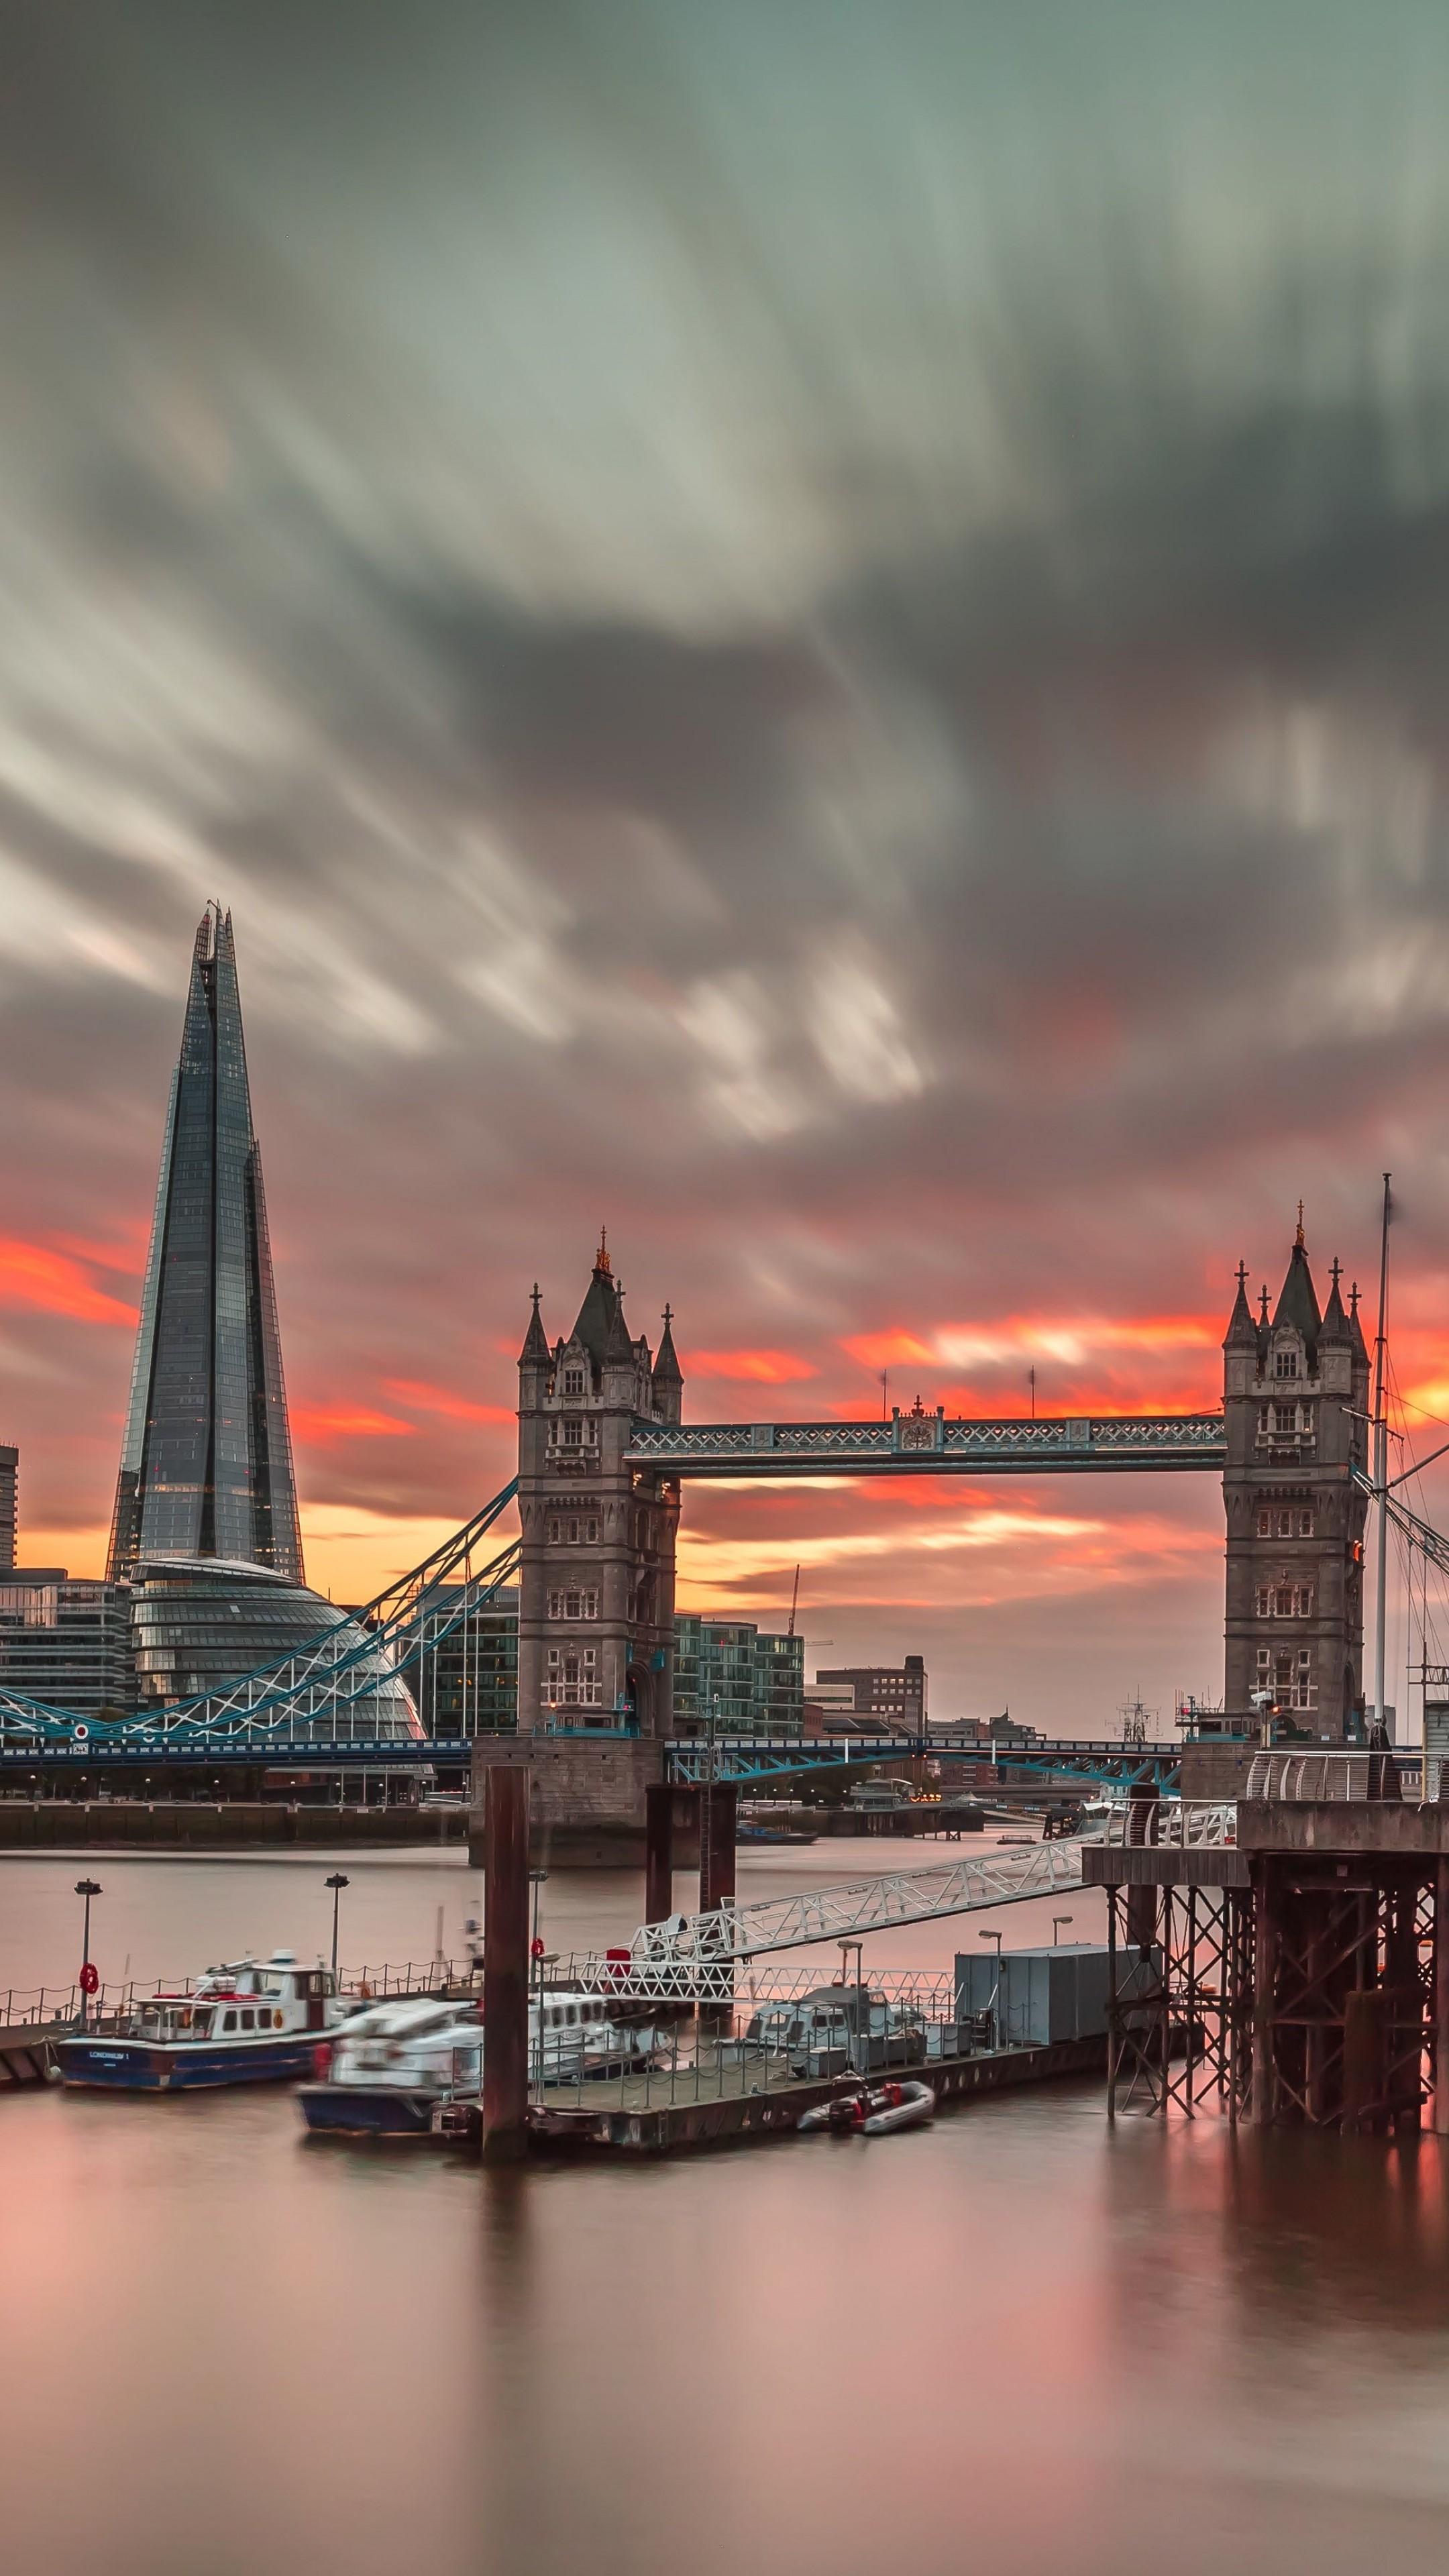 Wallpaper London England Europe Travel Tourism Sunset Architecture 6551